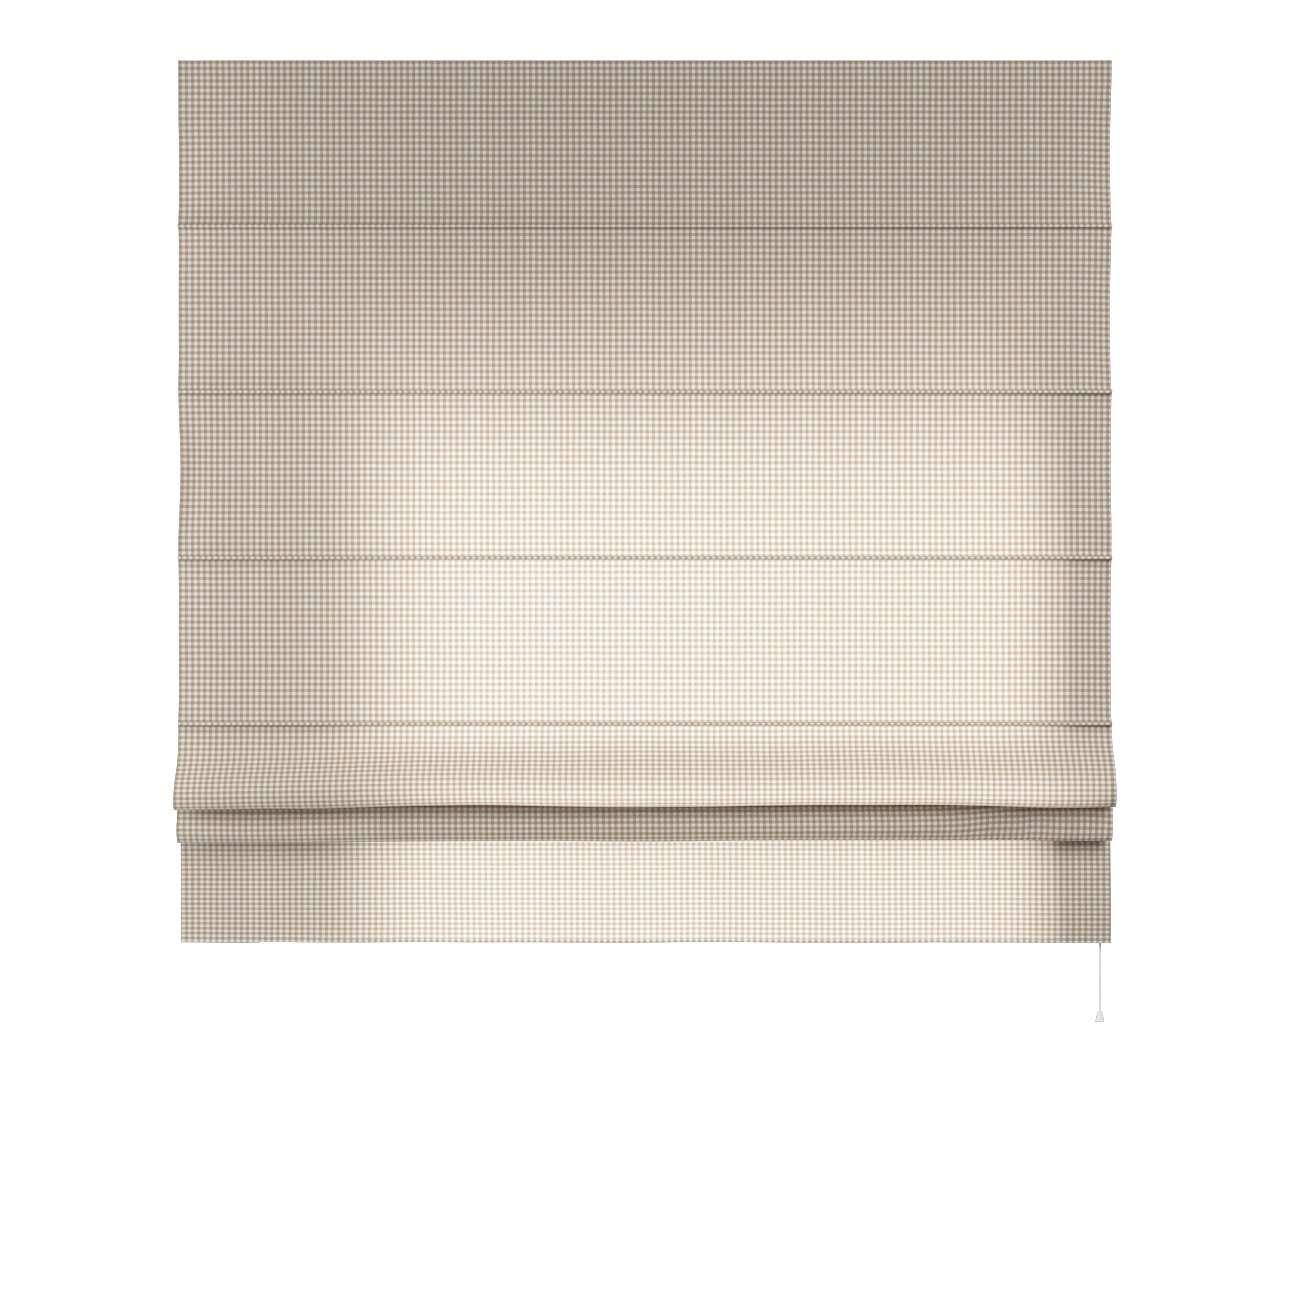 Raffrollo Padva 80 x 170 cm von der Kollektion Quadro, Stoff: 136-05